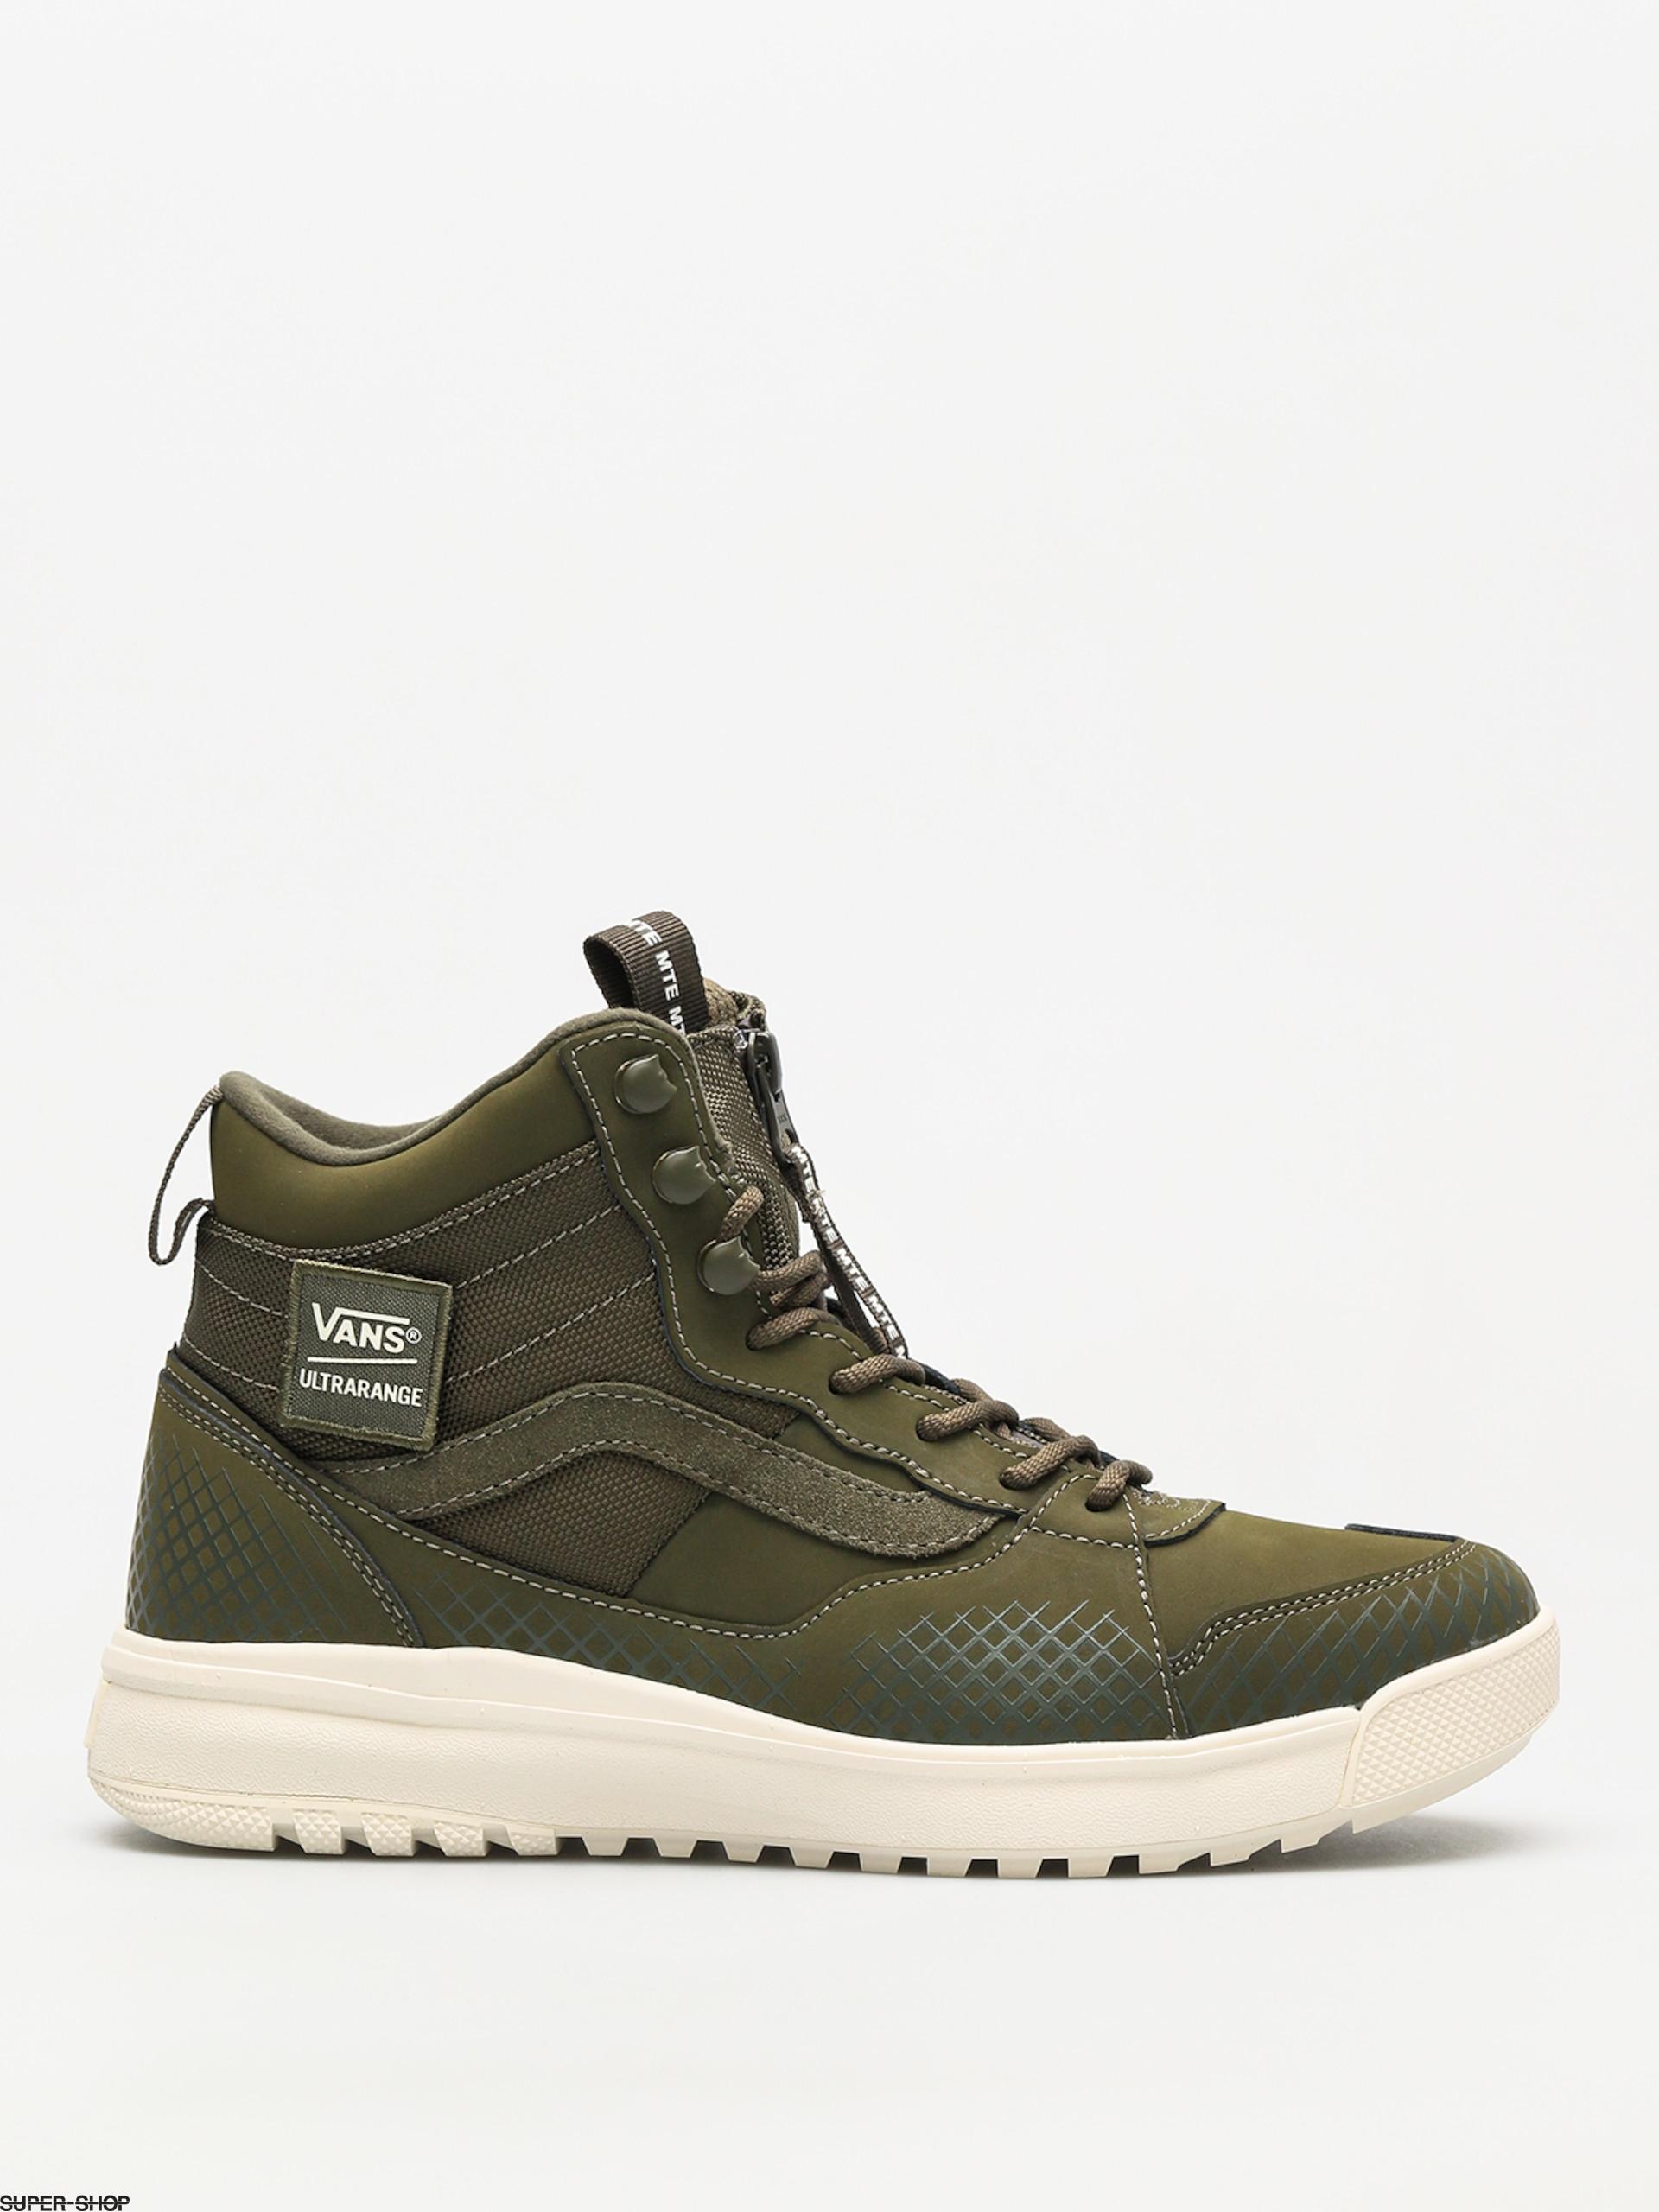 Vans Shoes Ultrarange Hi Dx Zpr Mte